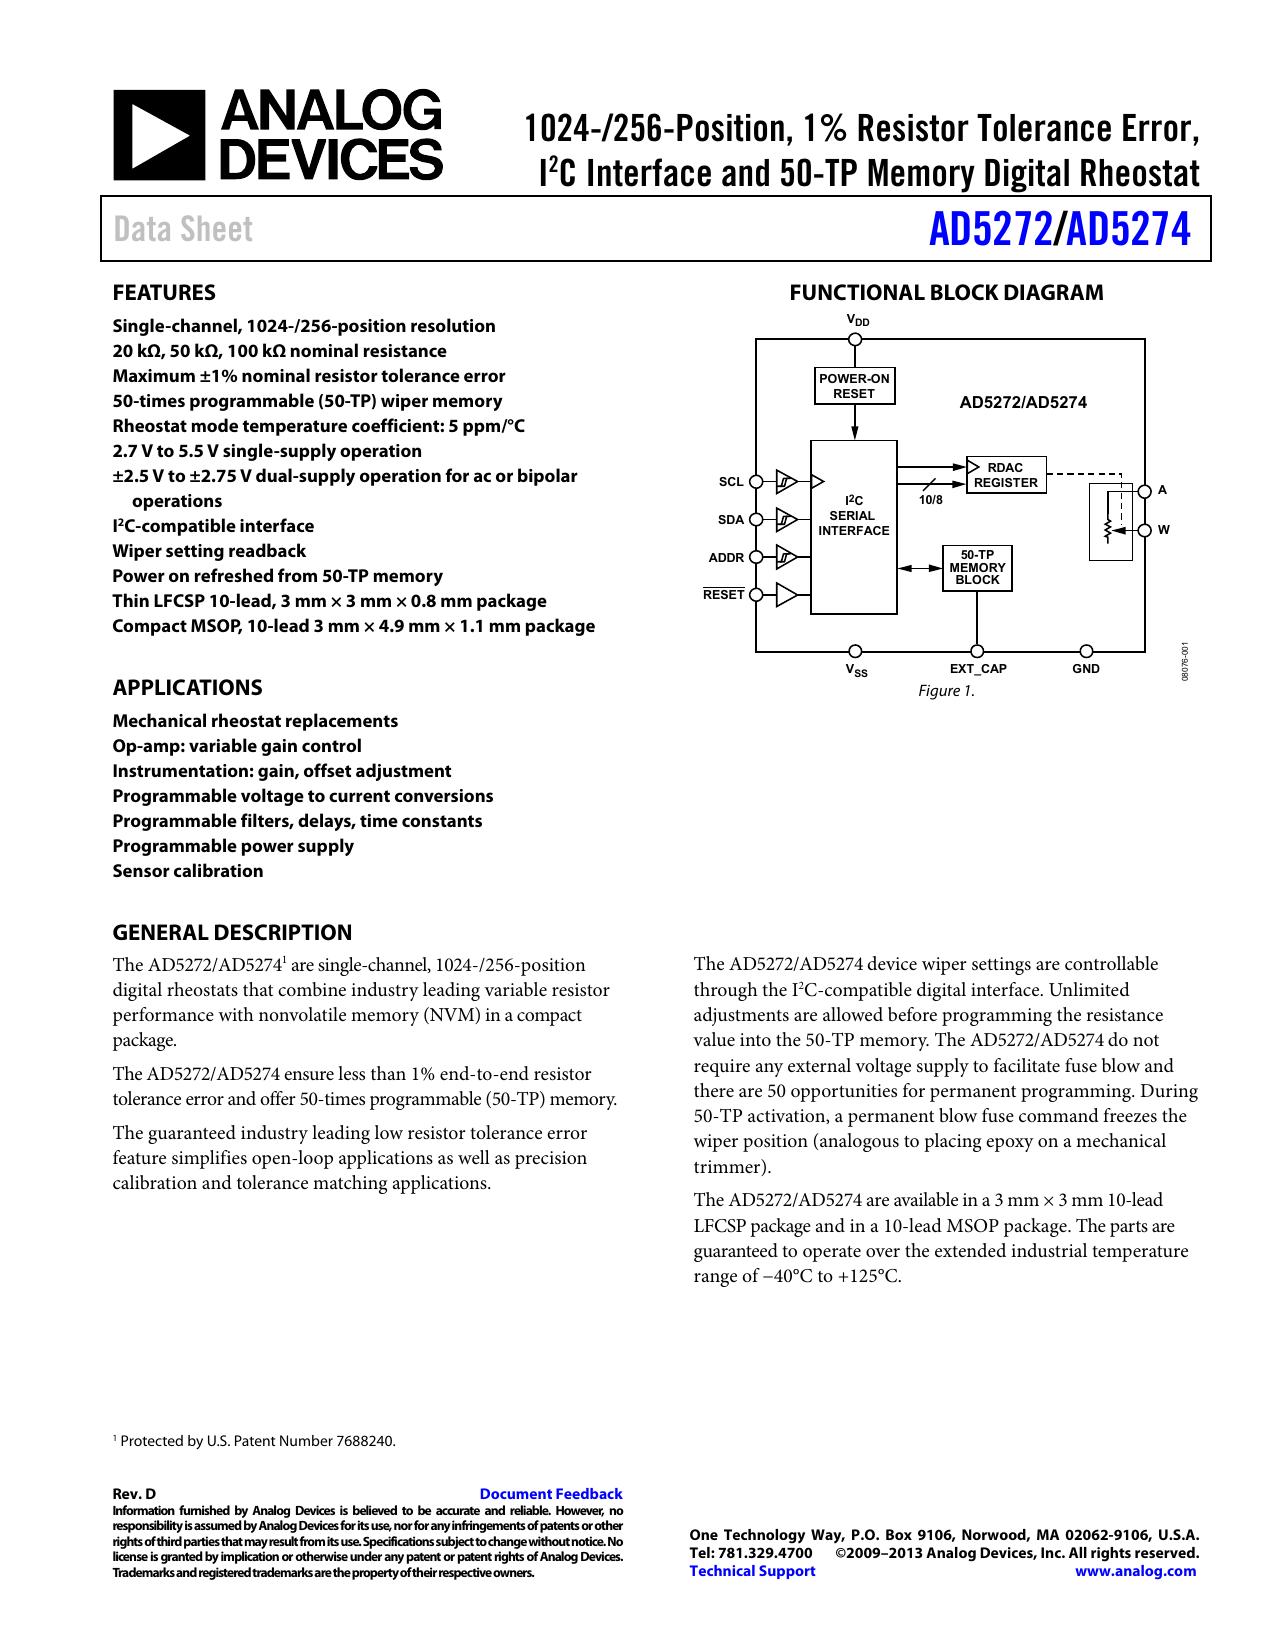 AD5272 AD5274 / 1024-/256-Position, 1% Resistor Tolerance Error,